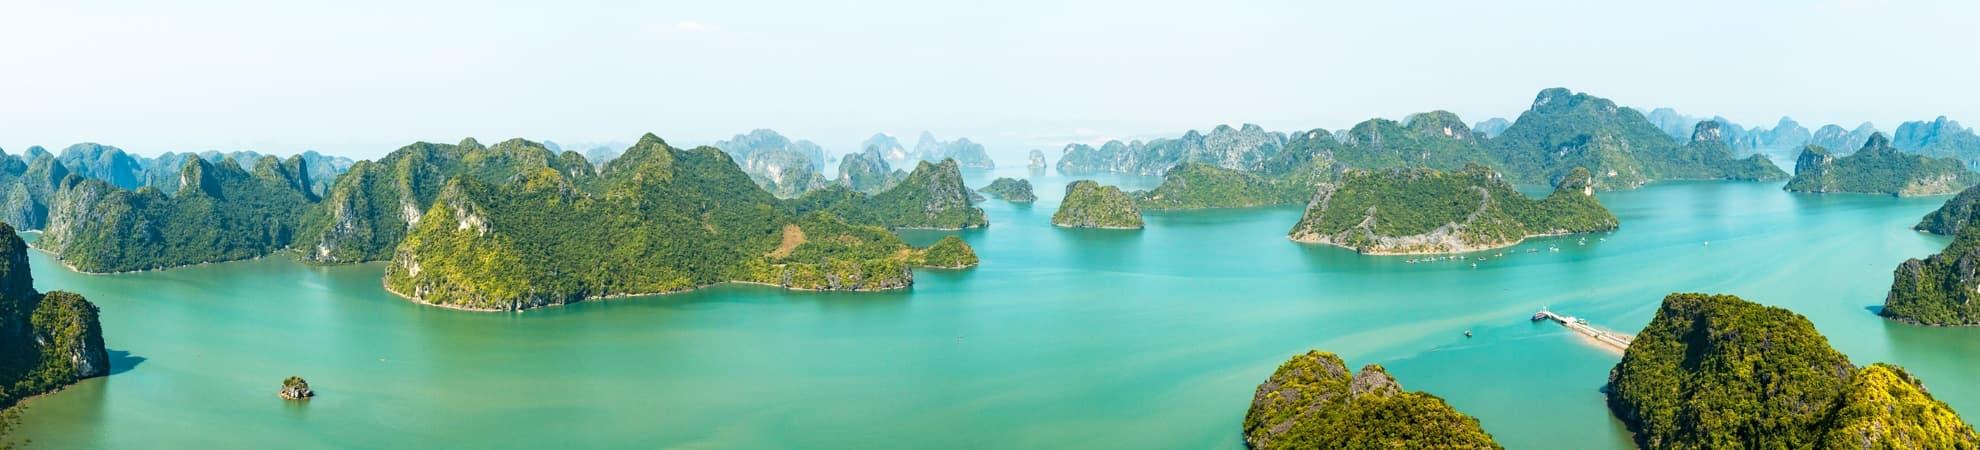 voyage baie halong